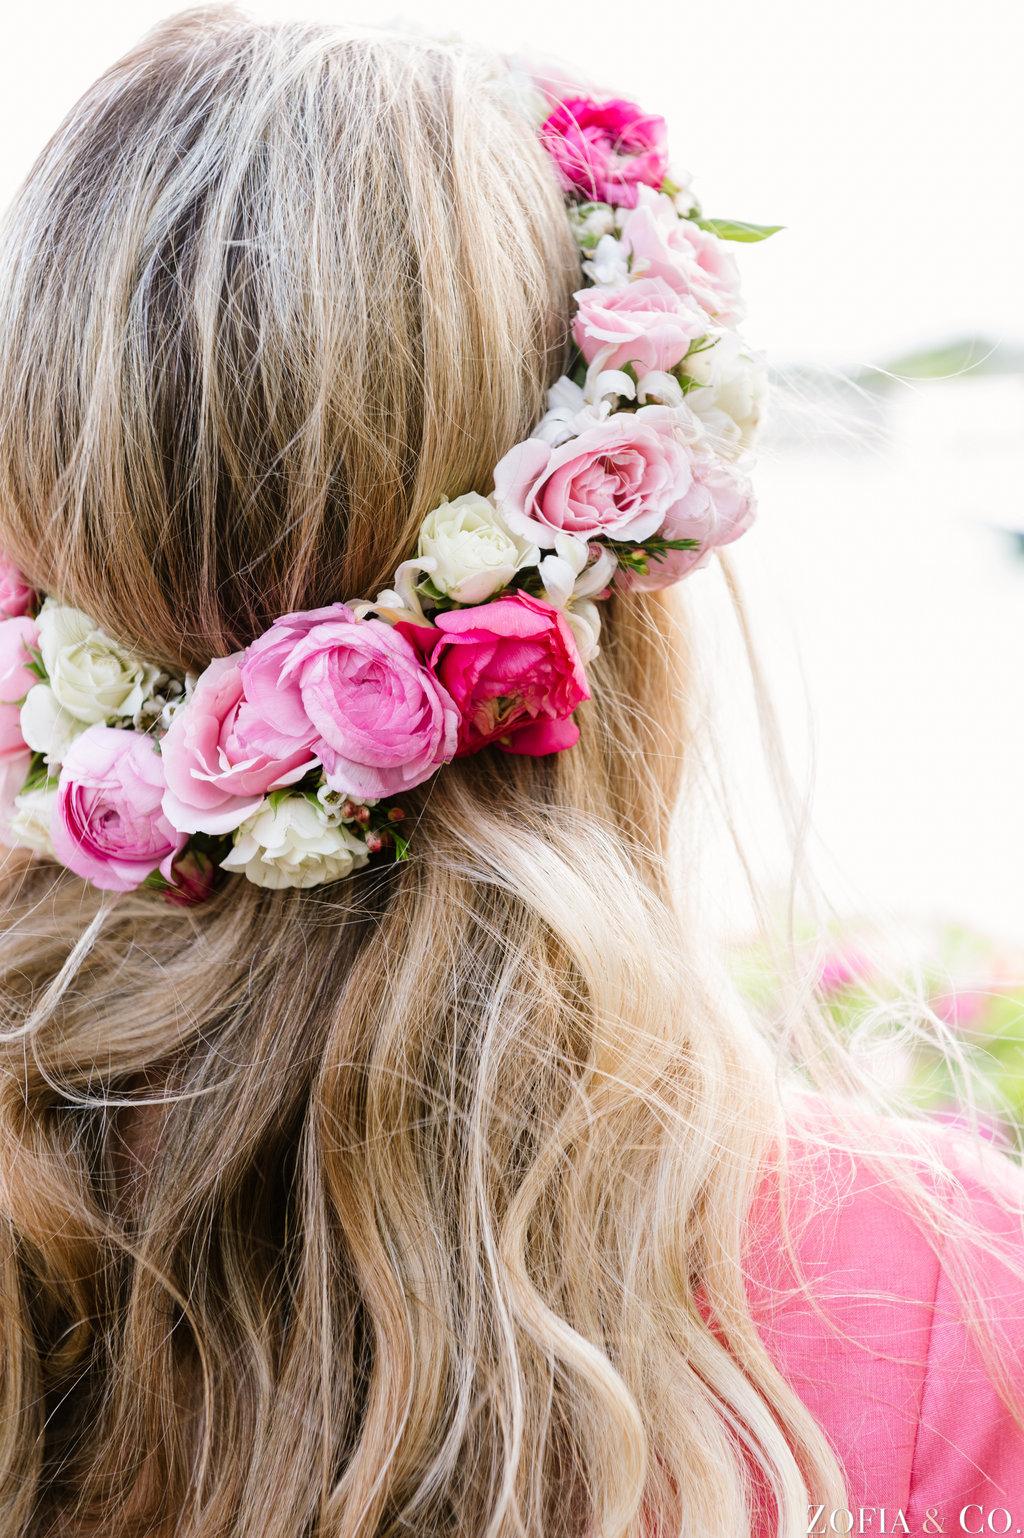 Ceci_New_York_Style_Luxury_Custom_Summer_Wedding_CeciBride_Nautical_Blue_Gold_Letterpress_Foil_188.jpg